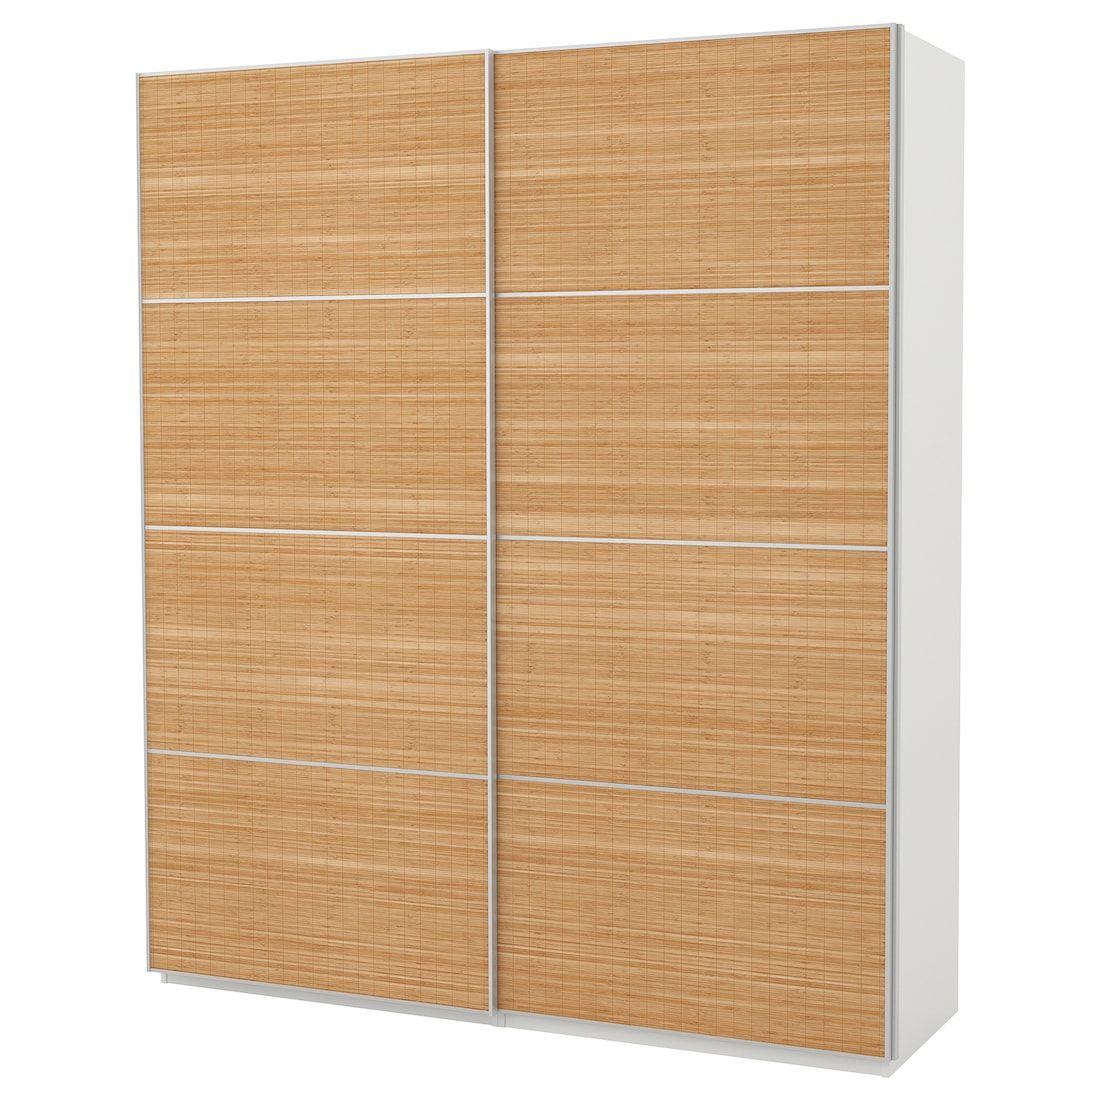 Pax Wardrobe White Fjellhamar Dark Bamboo Ikea Pax Wardrobe Sliding Doors Door Frame